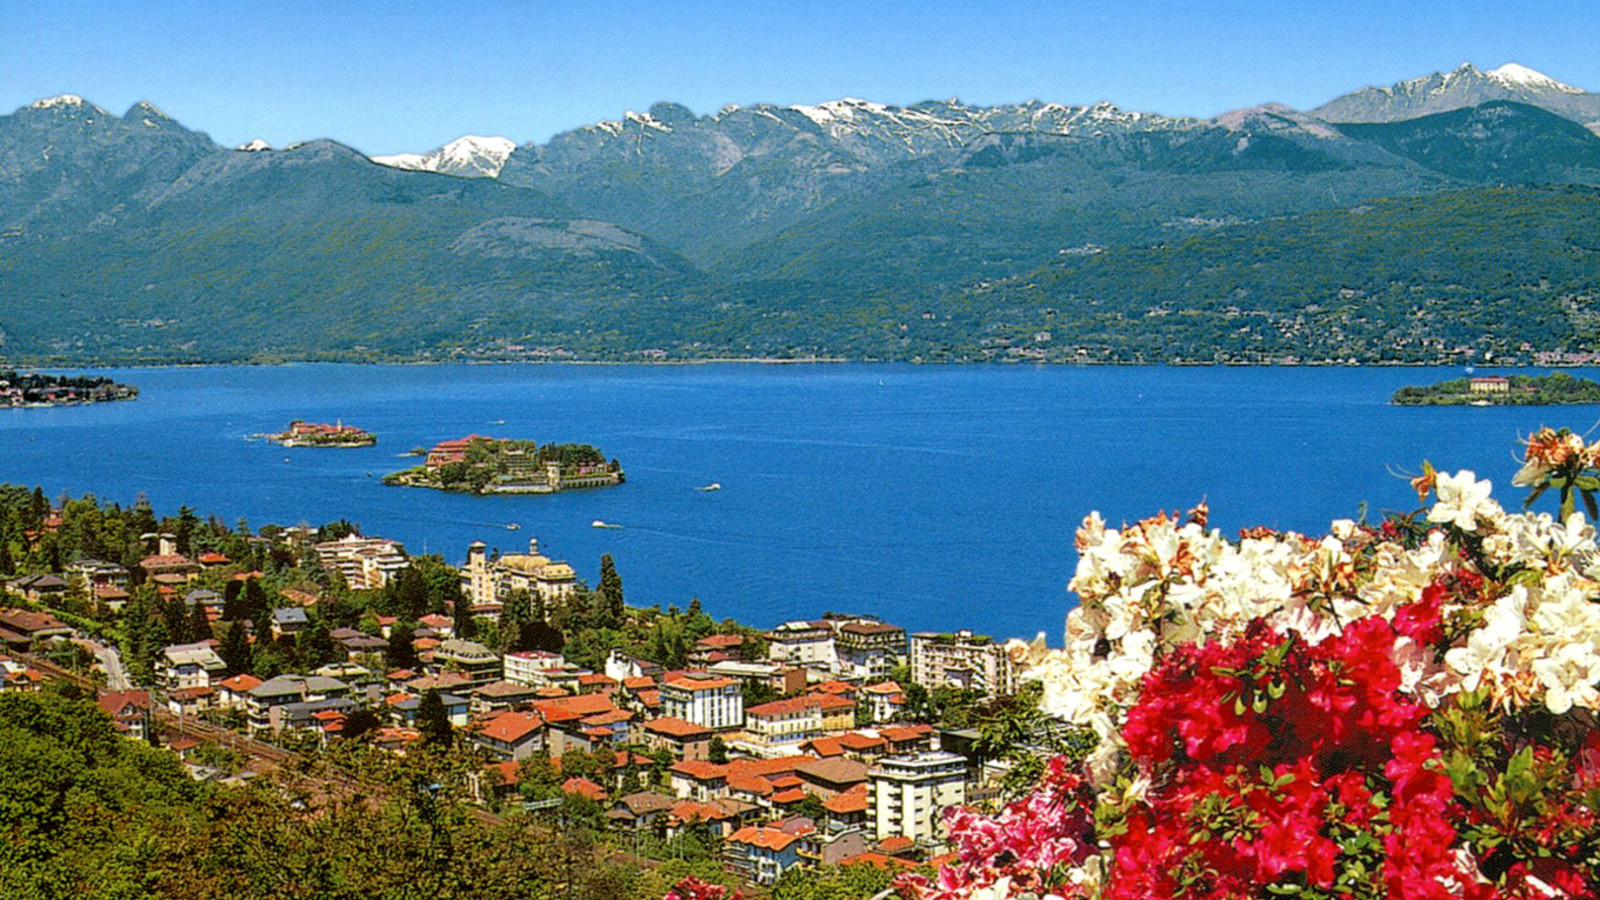 Holidays to stresa lake maggiore topflight italy for Stresa lake maggiore